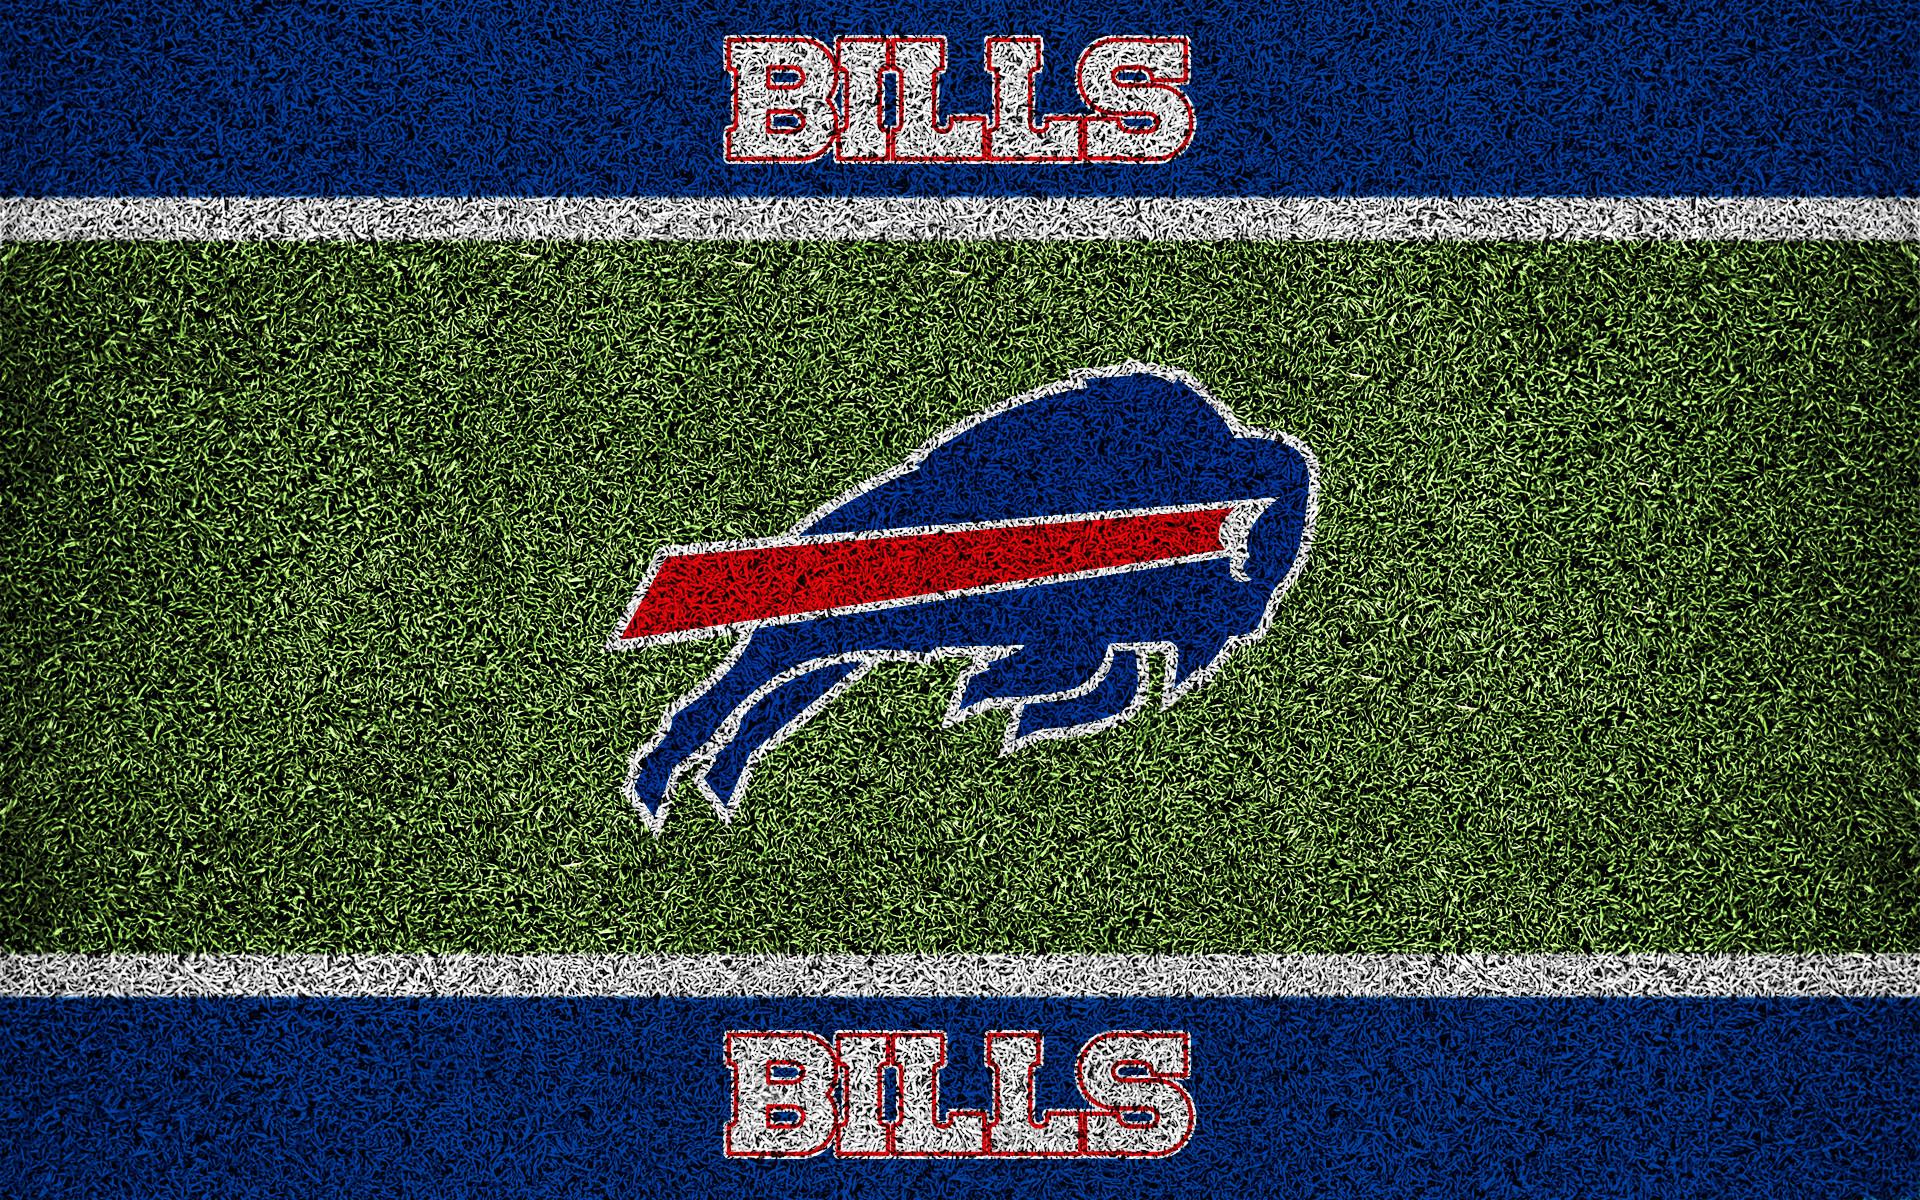 buffalo sabers goal song